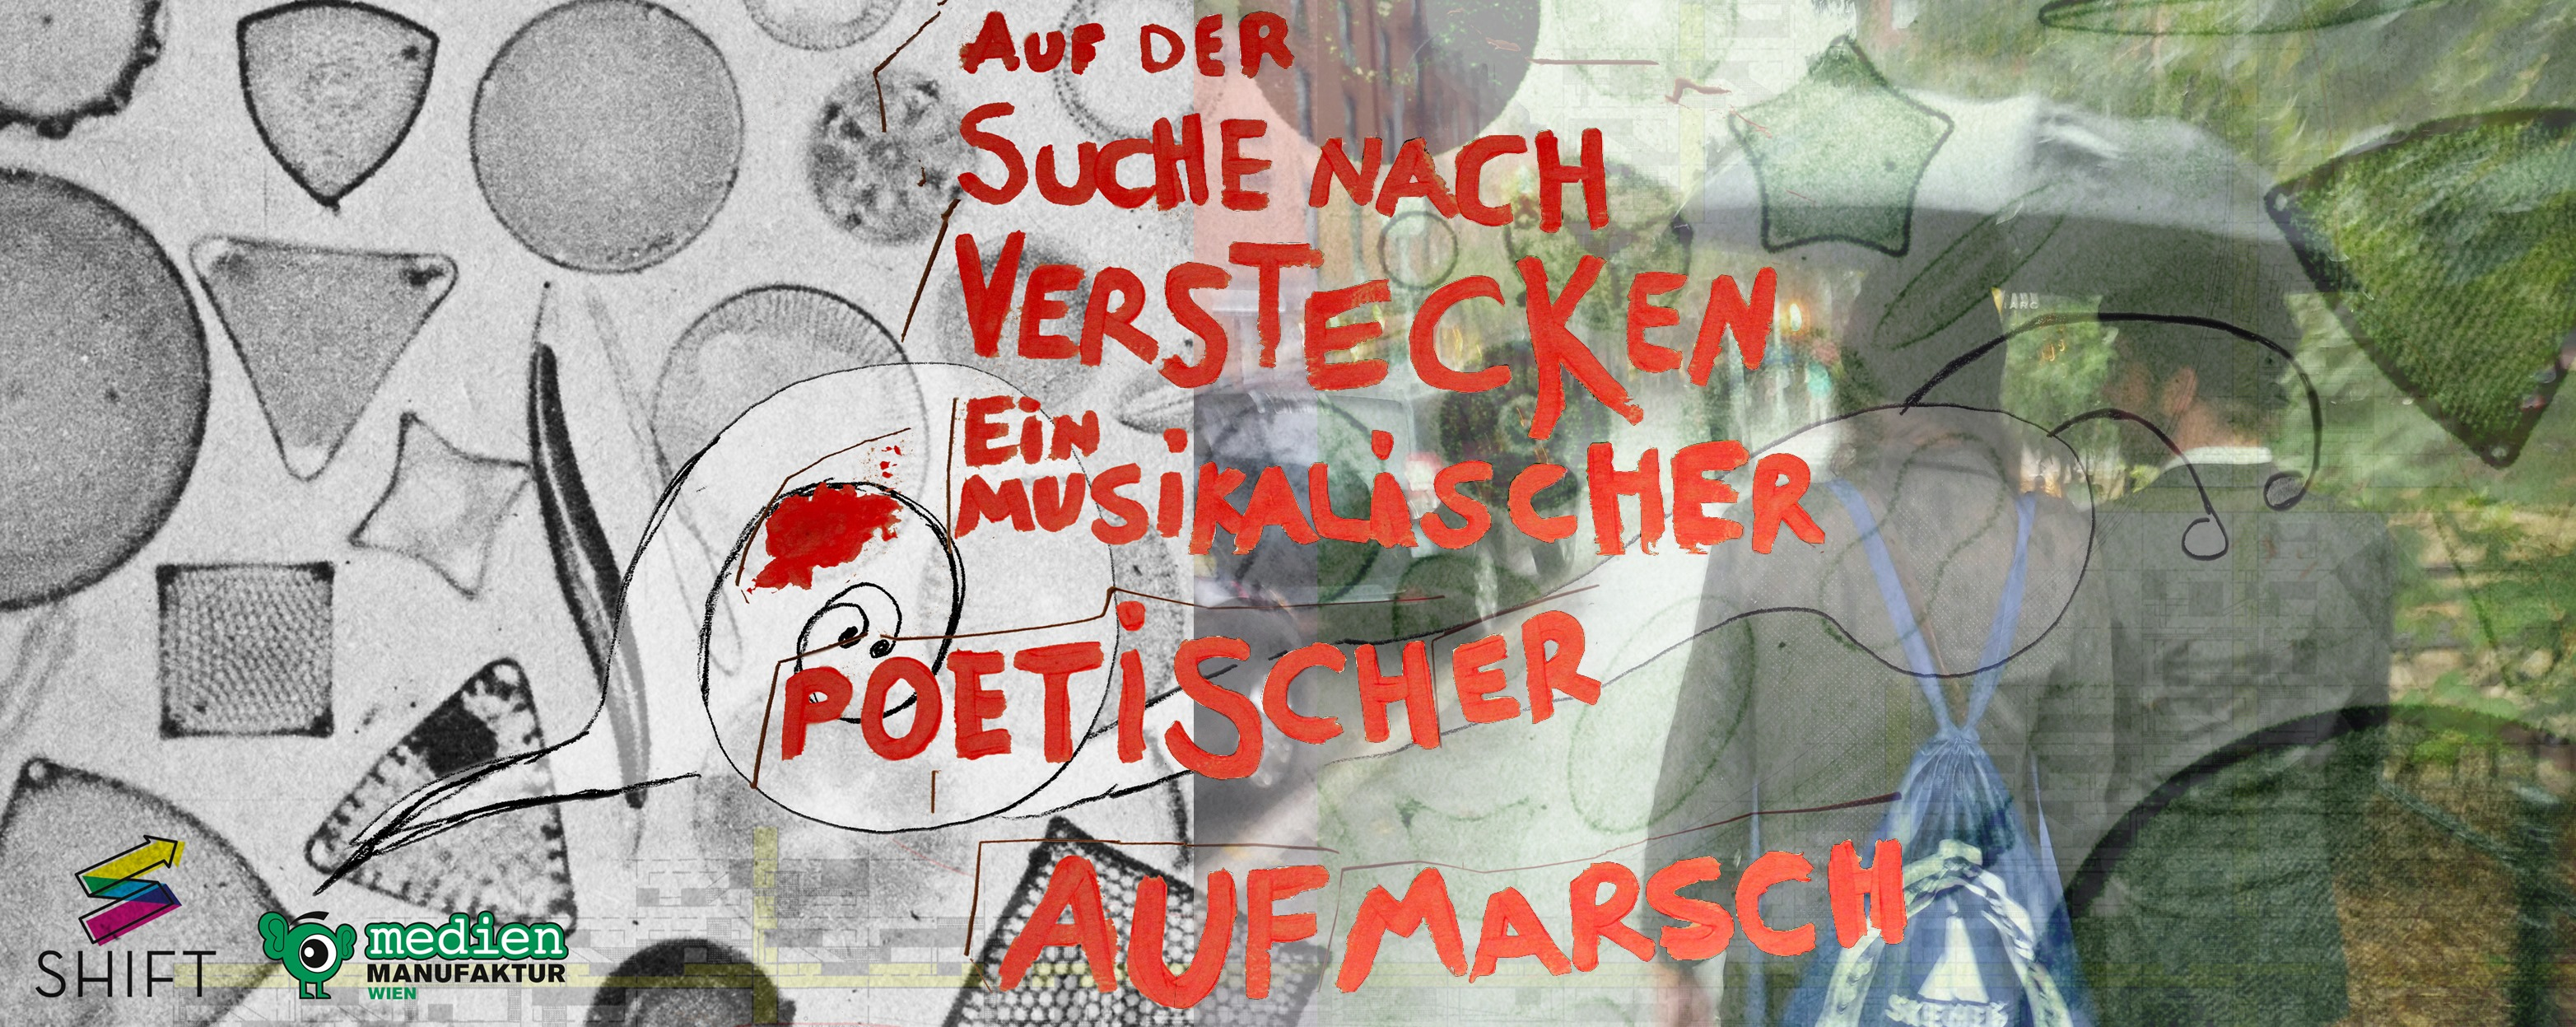 Versteck 6: Playbackdolls bei Materialnomaden/Urbanize Festival